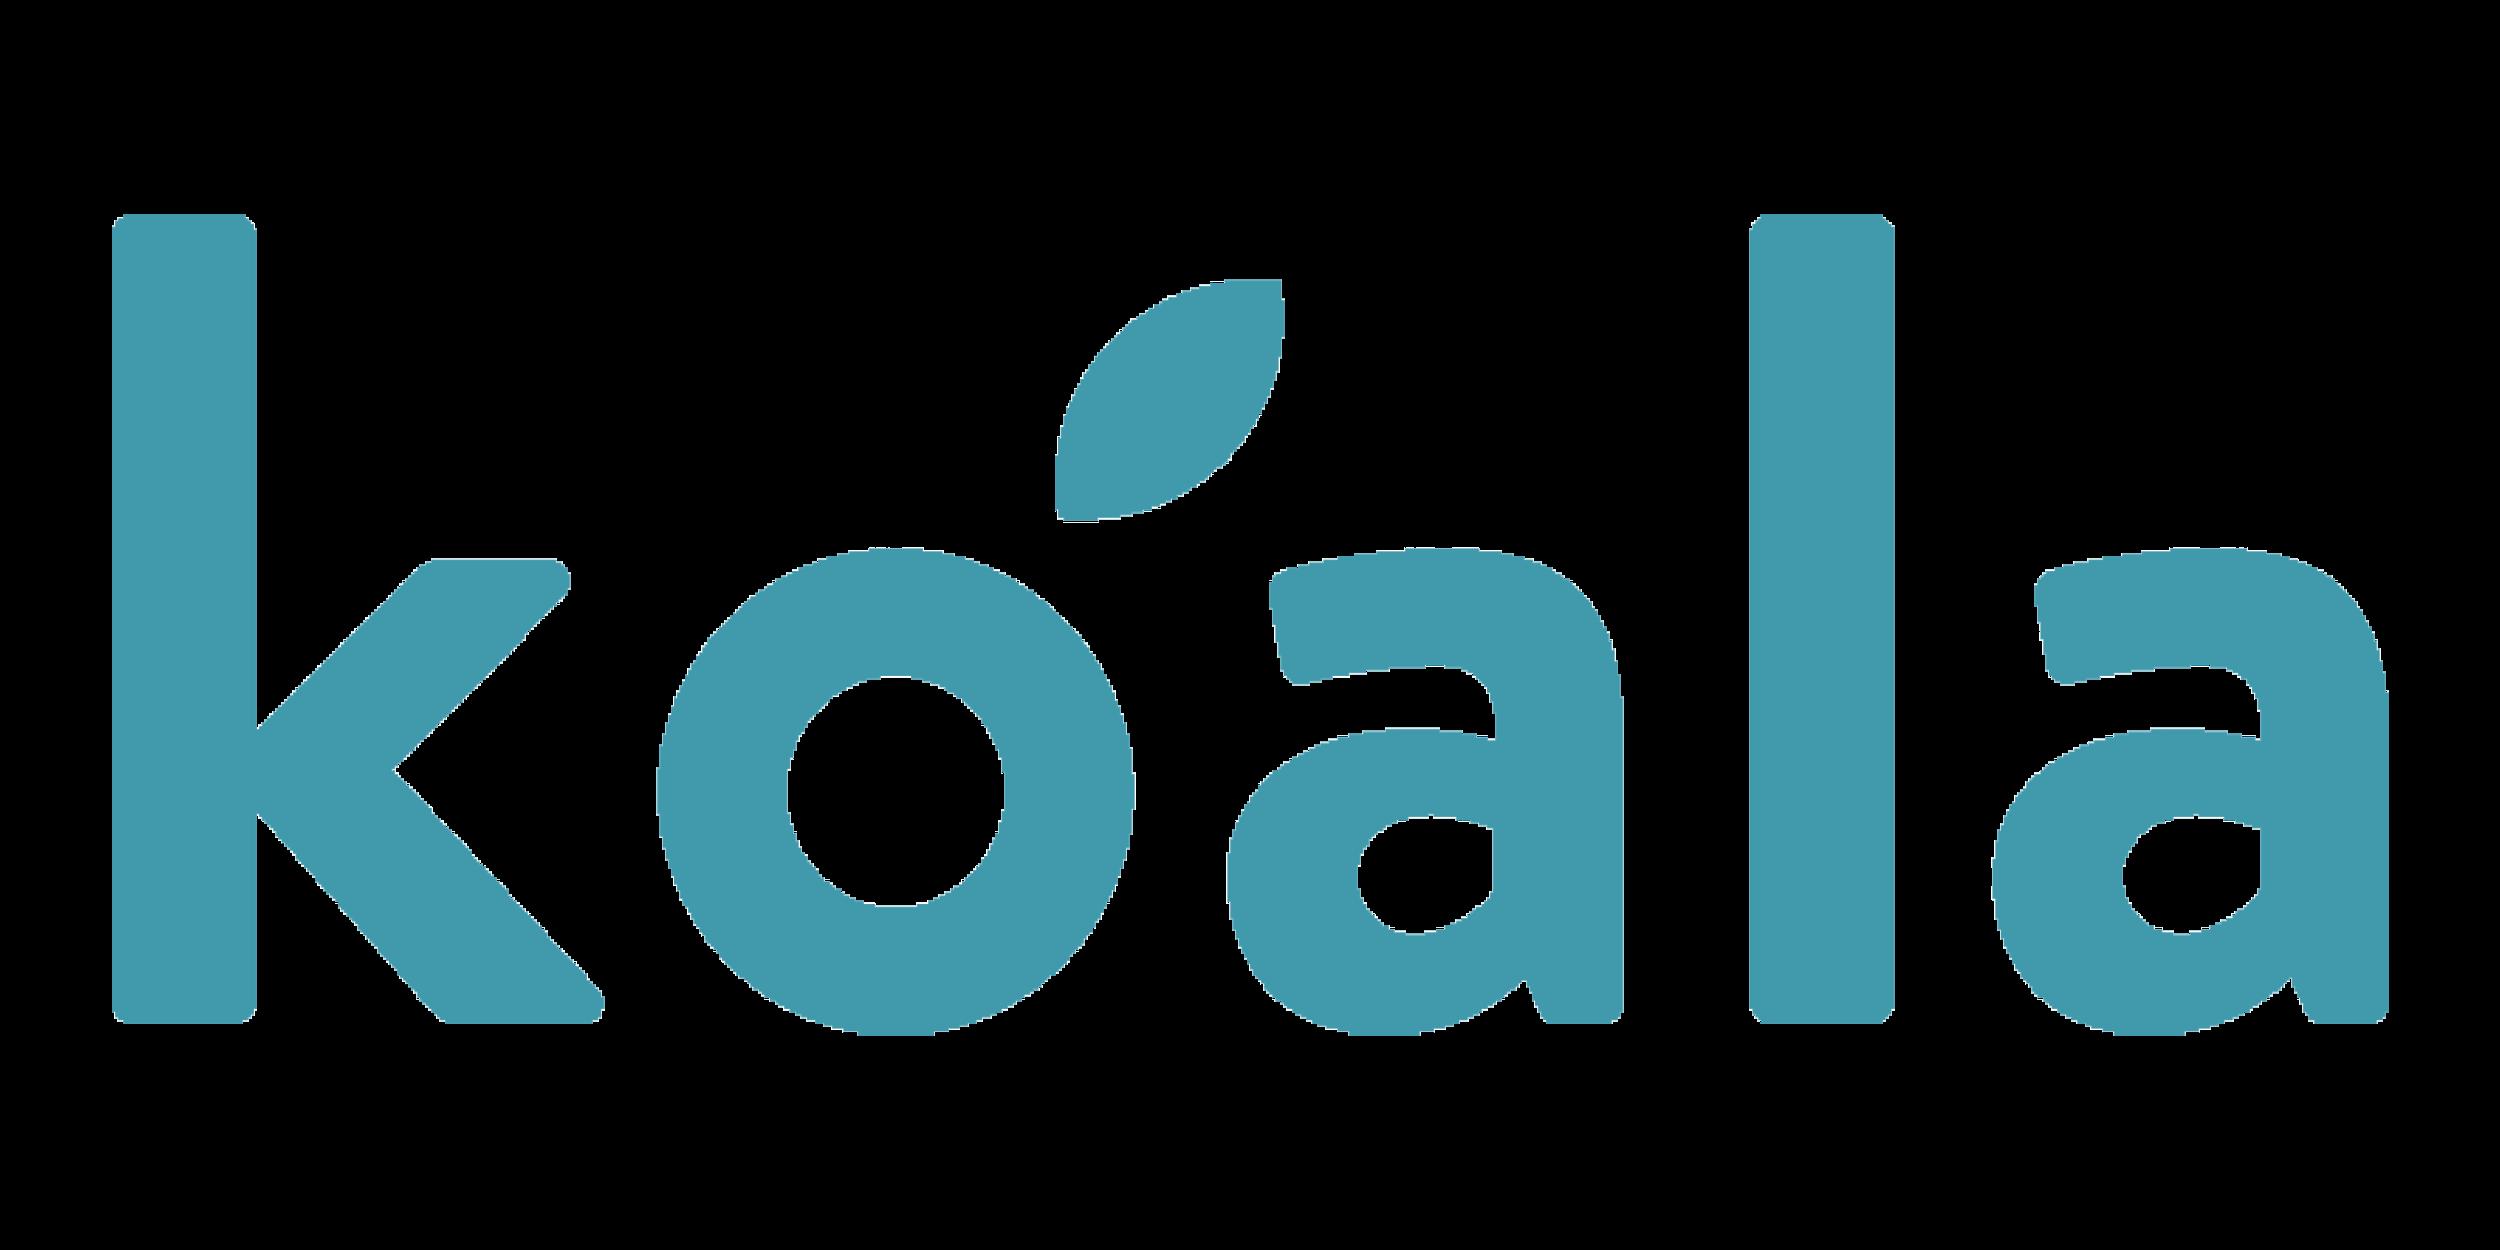 Logos for Koala giveaway.png